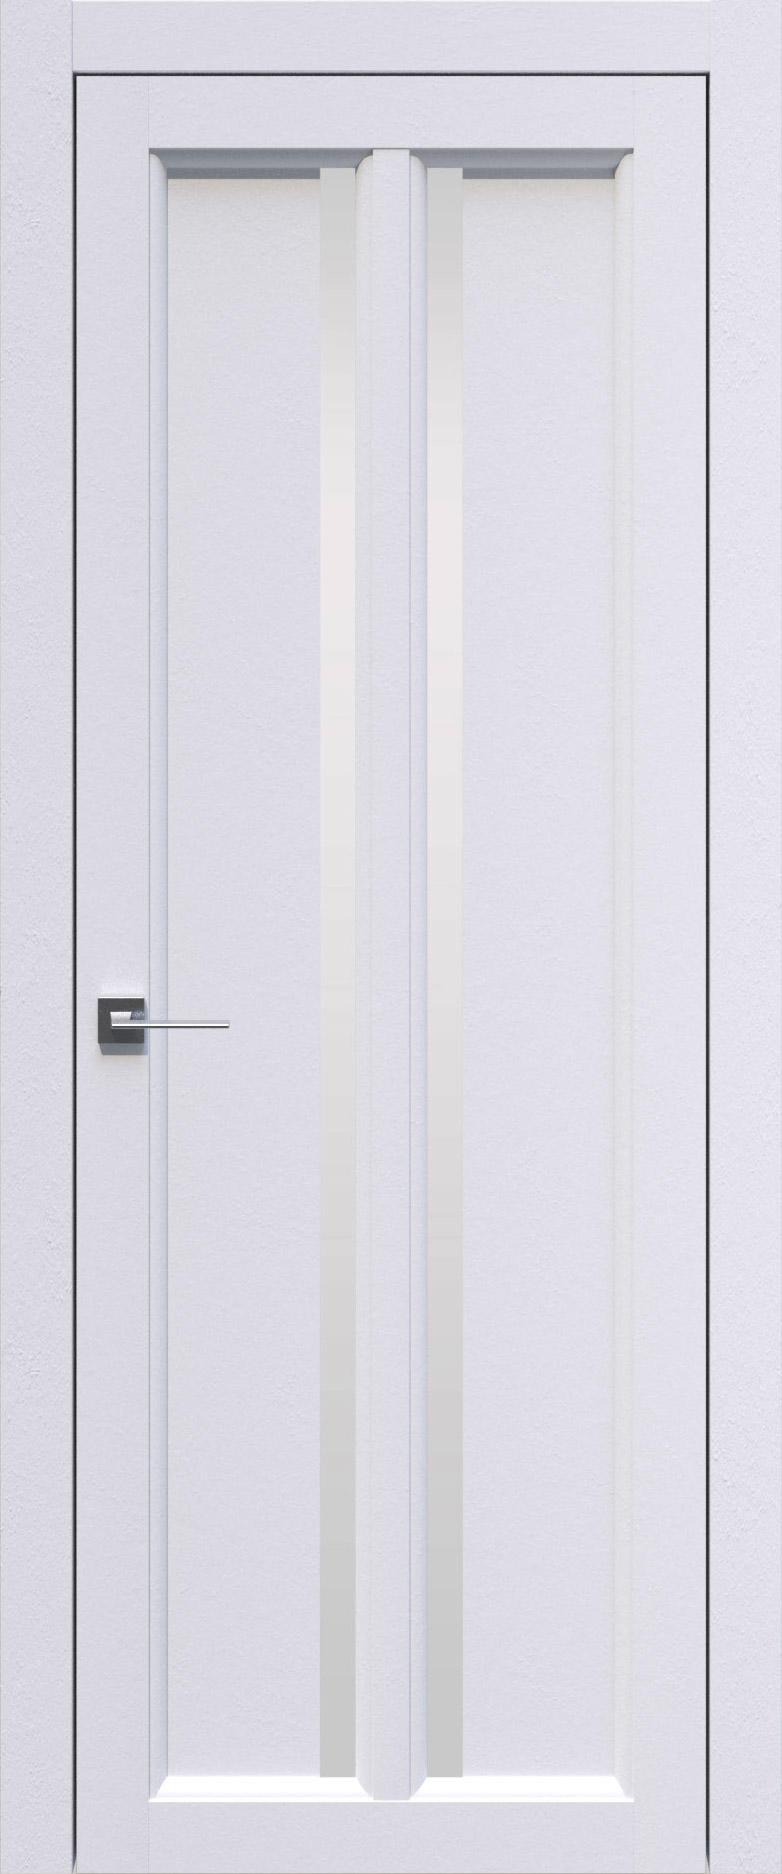 Sorrento-R Е4 цвет - Арктик белый Без стекла (ДГ)